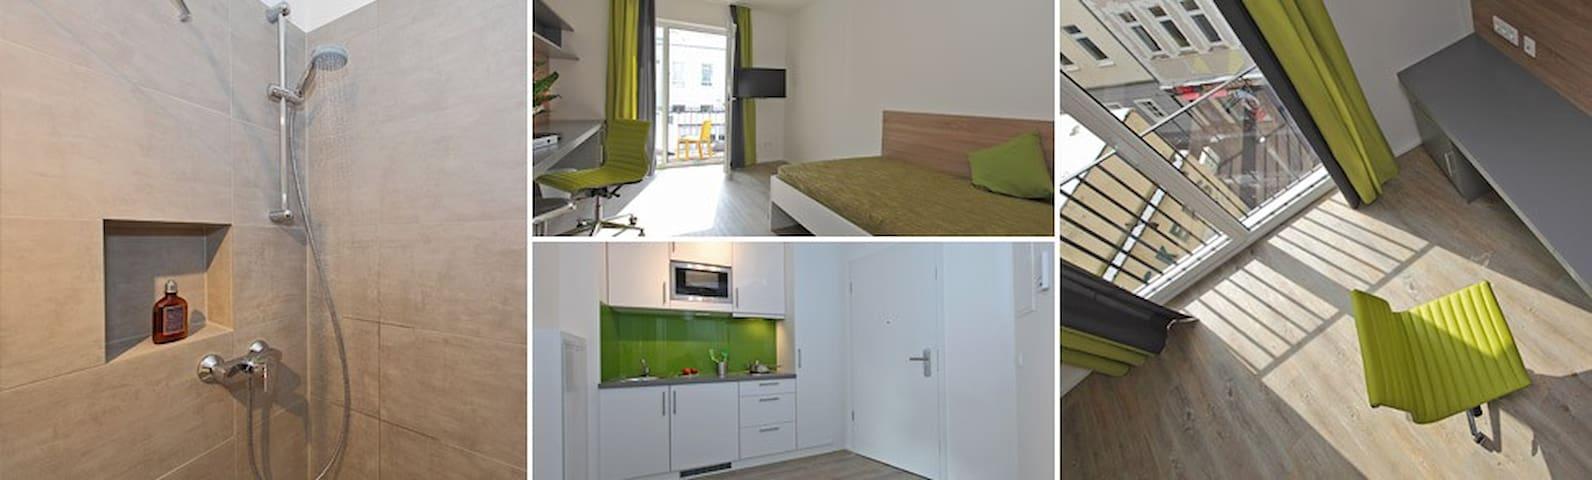 Voll möbliertes Zimmer im Bonner Zentrum - Bonn - Apartment